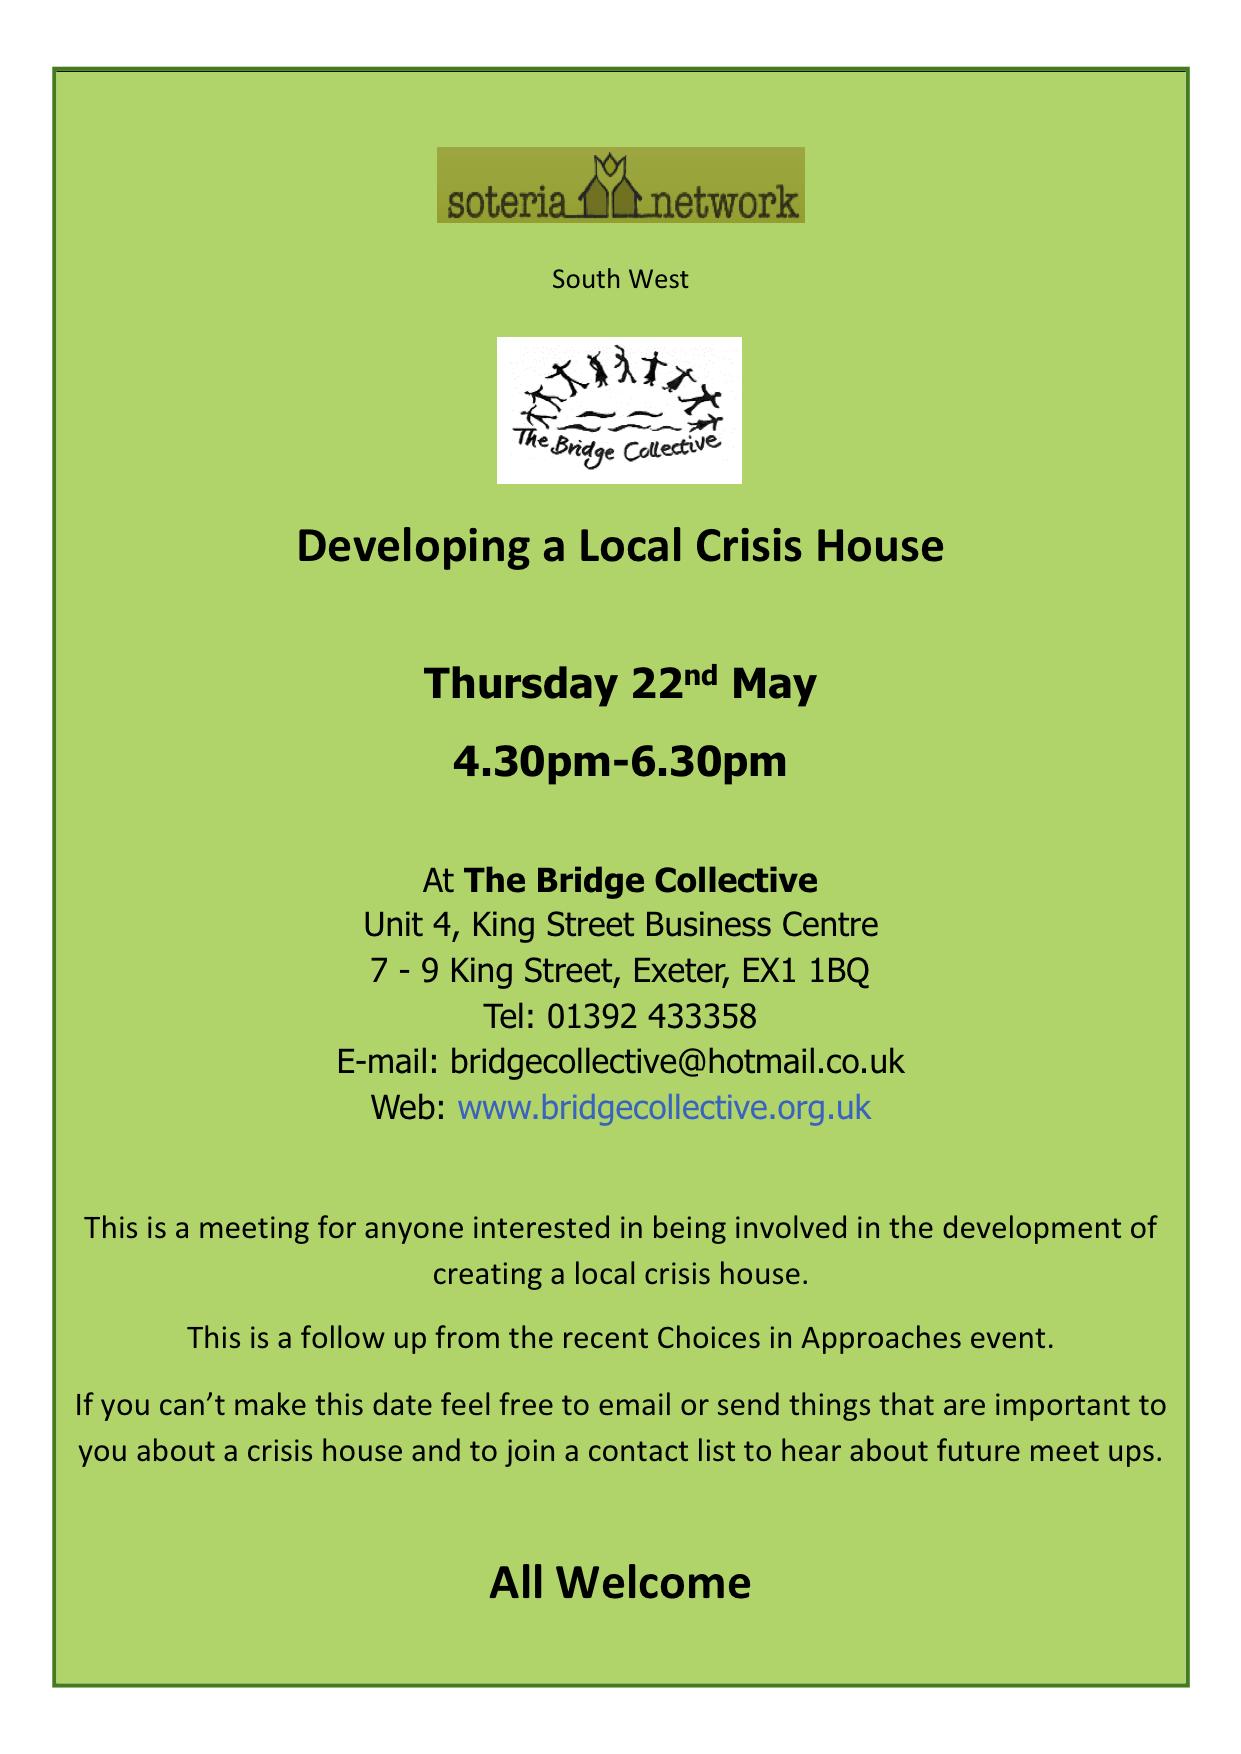 http://www.bridgecollective.org.uk/wp-content/uploads/2014/03/crisis-house-poster.jpg